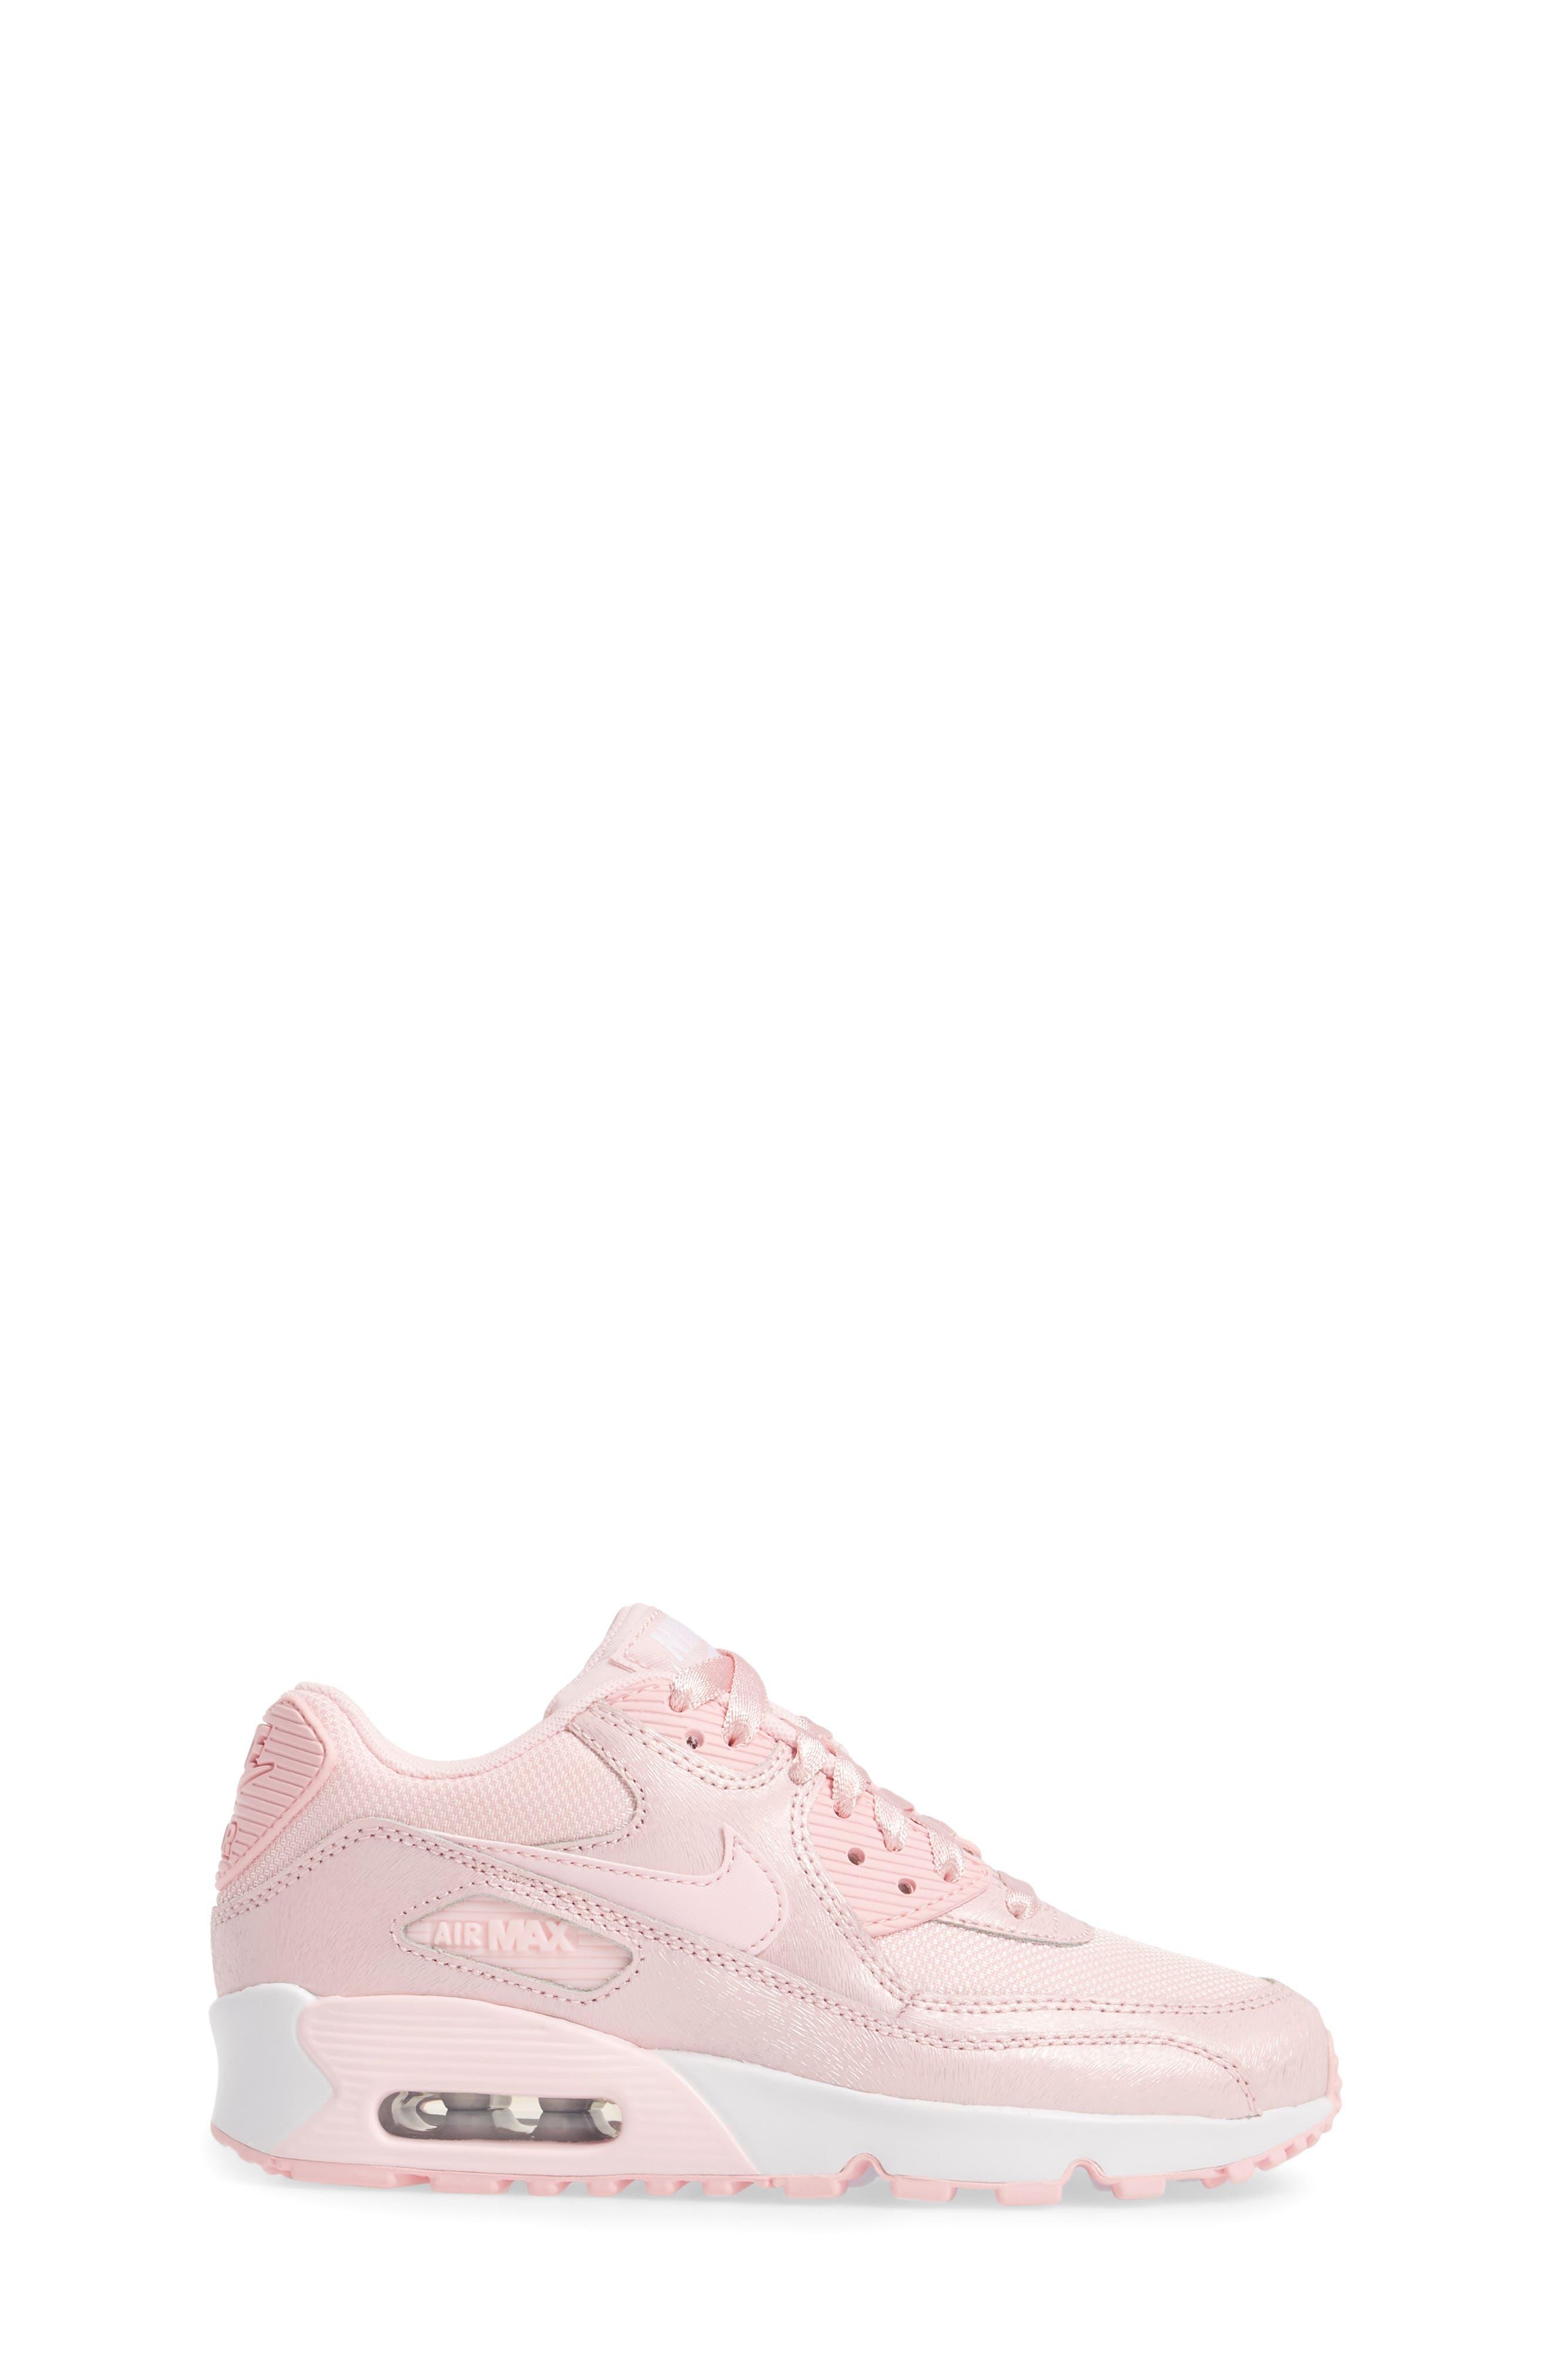 Air Max 90 Mesh Sneaker,                             Alternate thumbnail 2, color,                             Prism Pink/ White